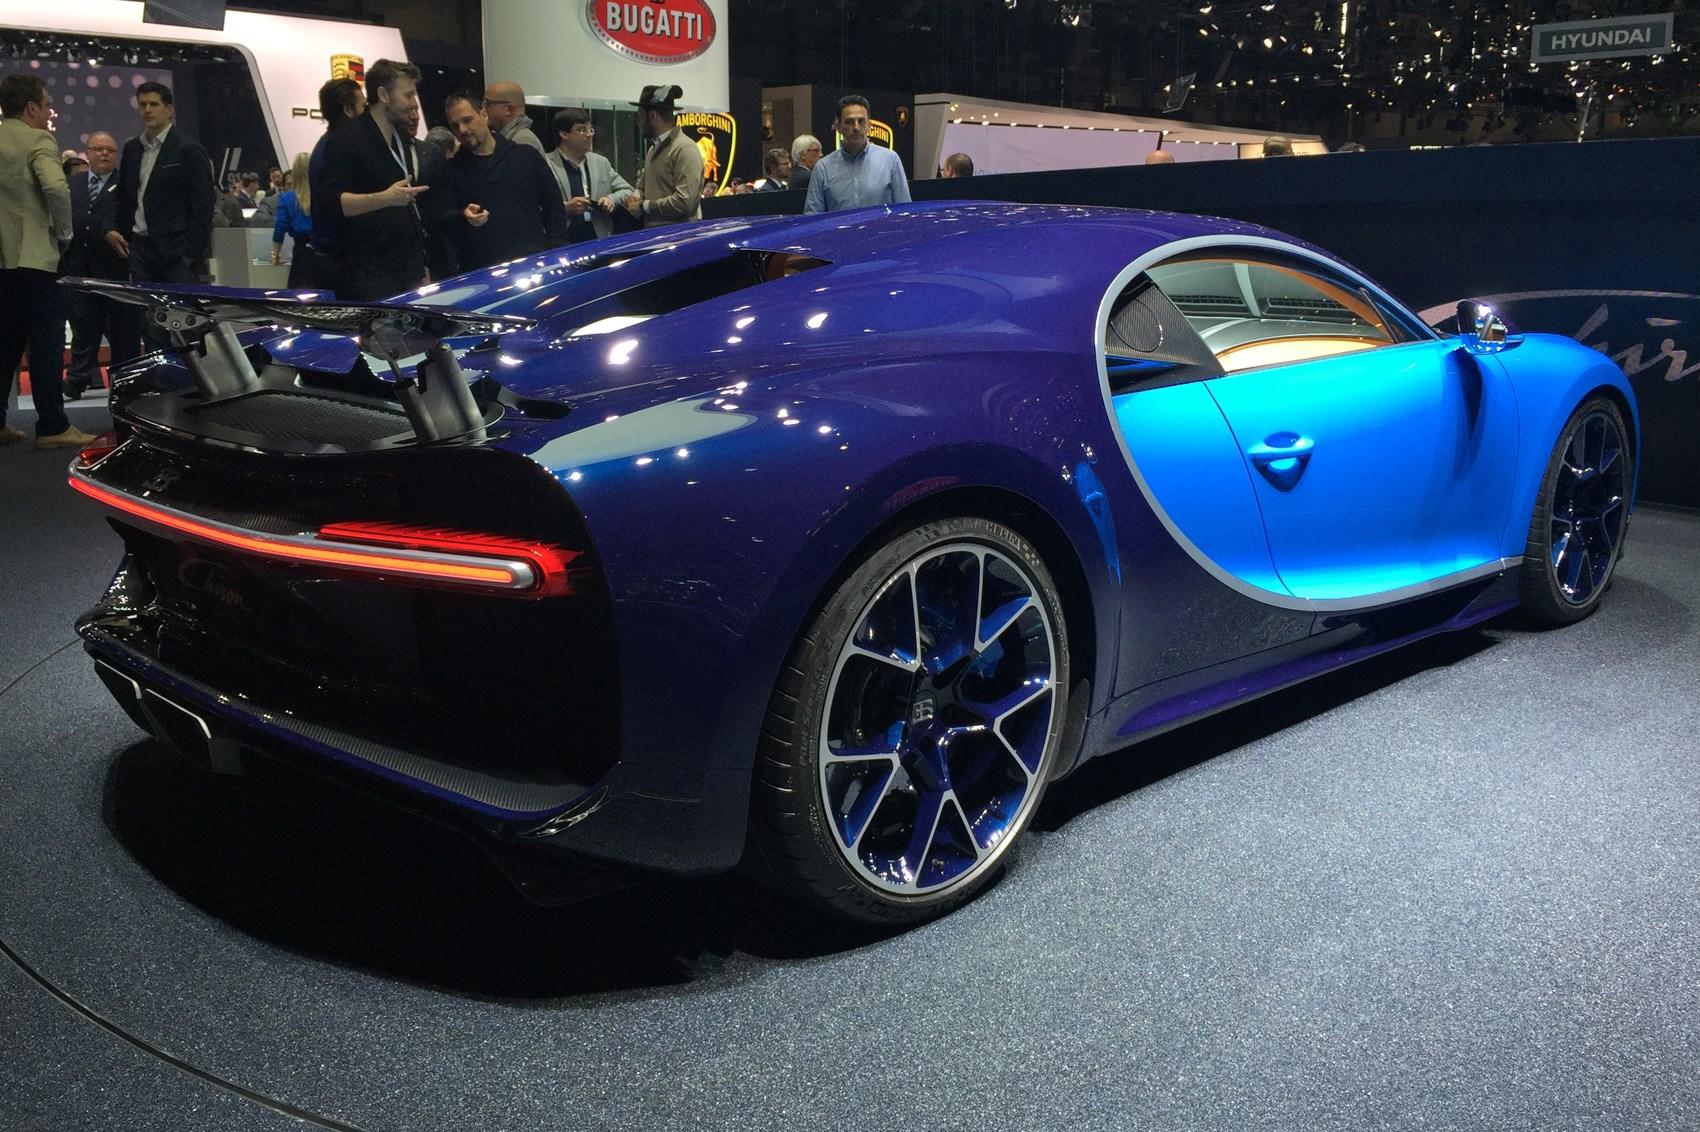 bugatti chiron revealed at geneva 2016: the world has a new